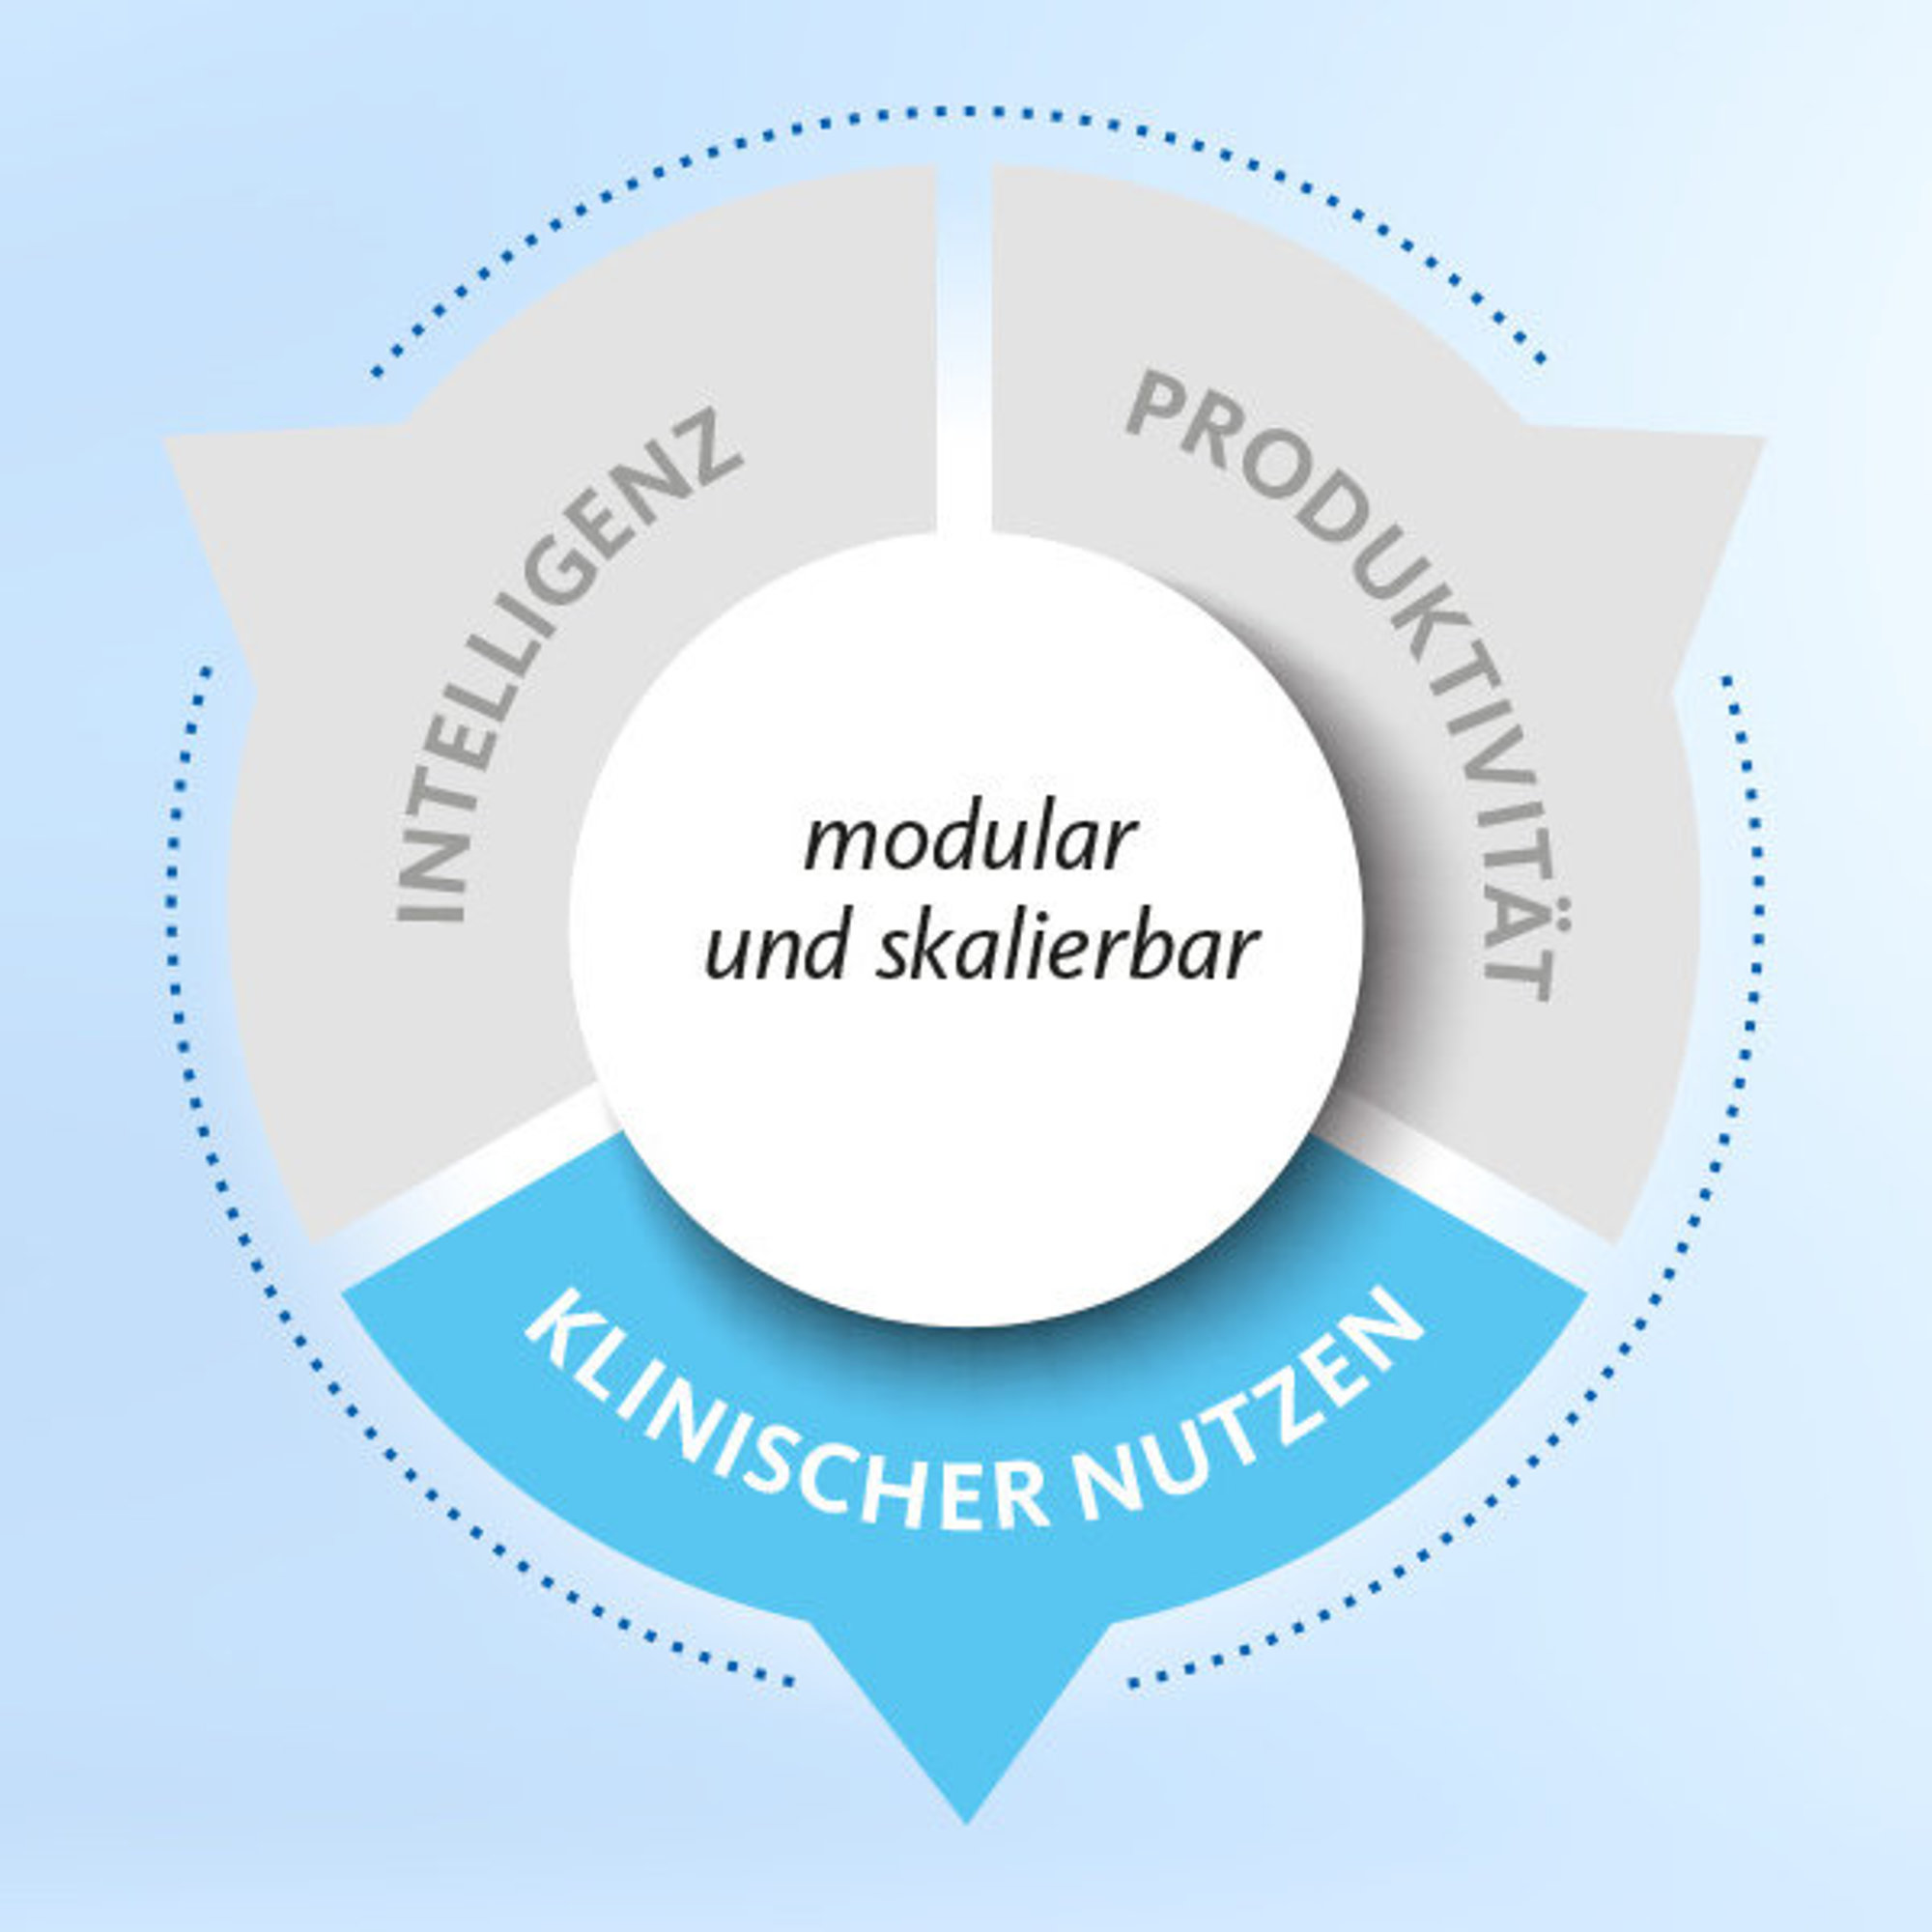 sysmex - Trillium GmbH Medizinischer Fachverlag